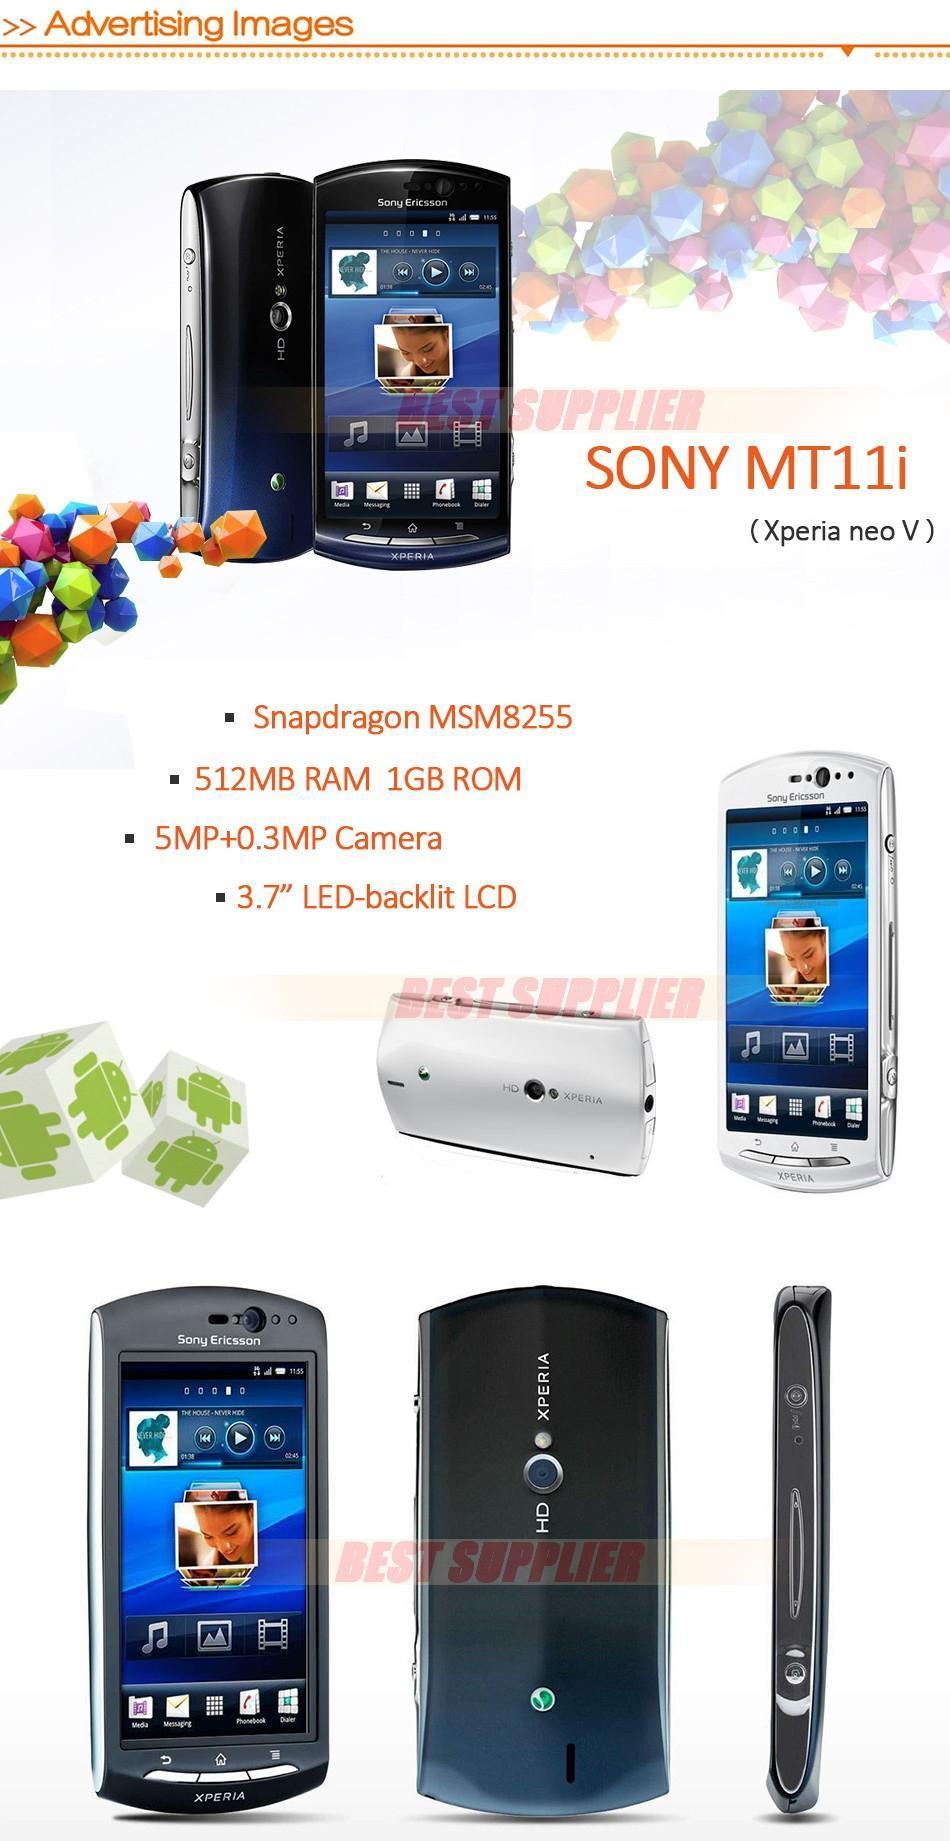 Sony ericsson mt11i xperia neo v инструкция